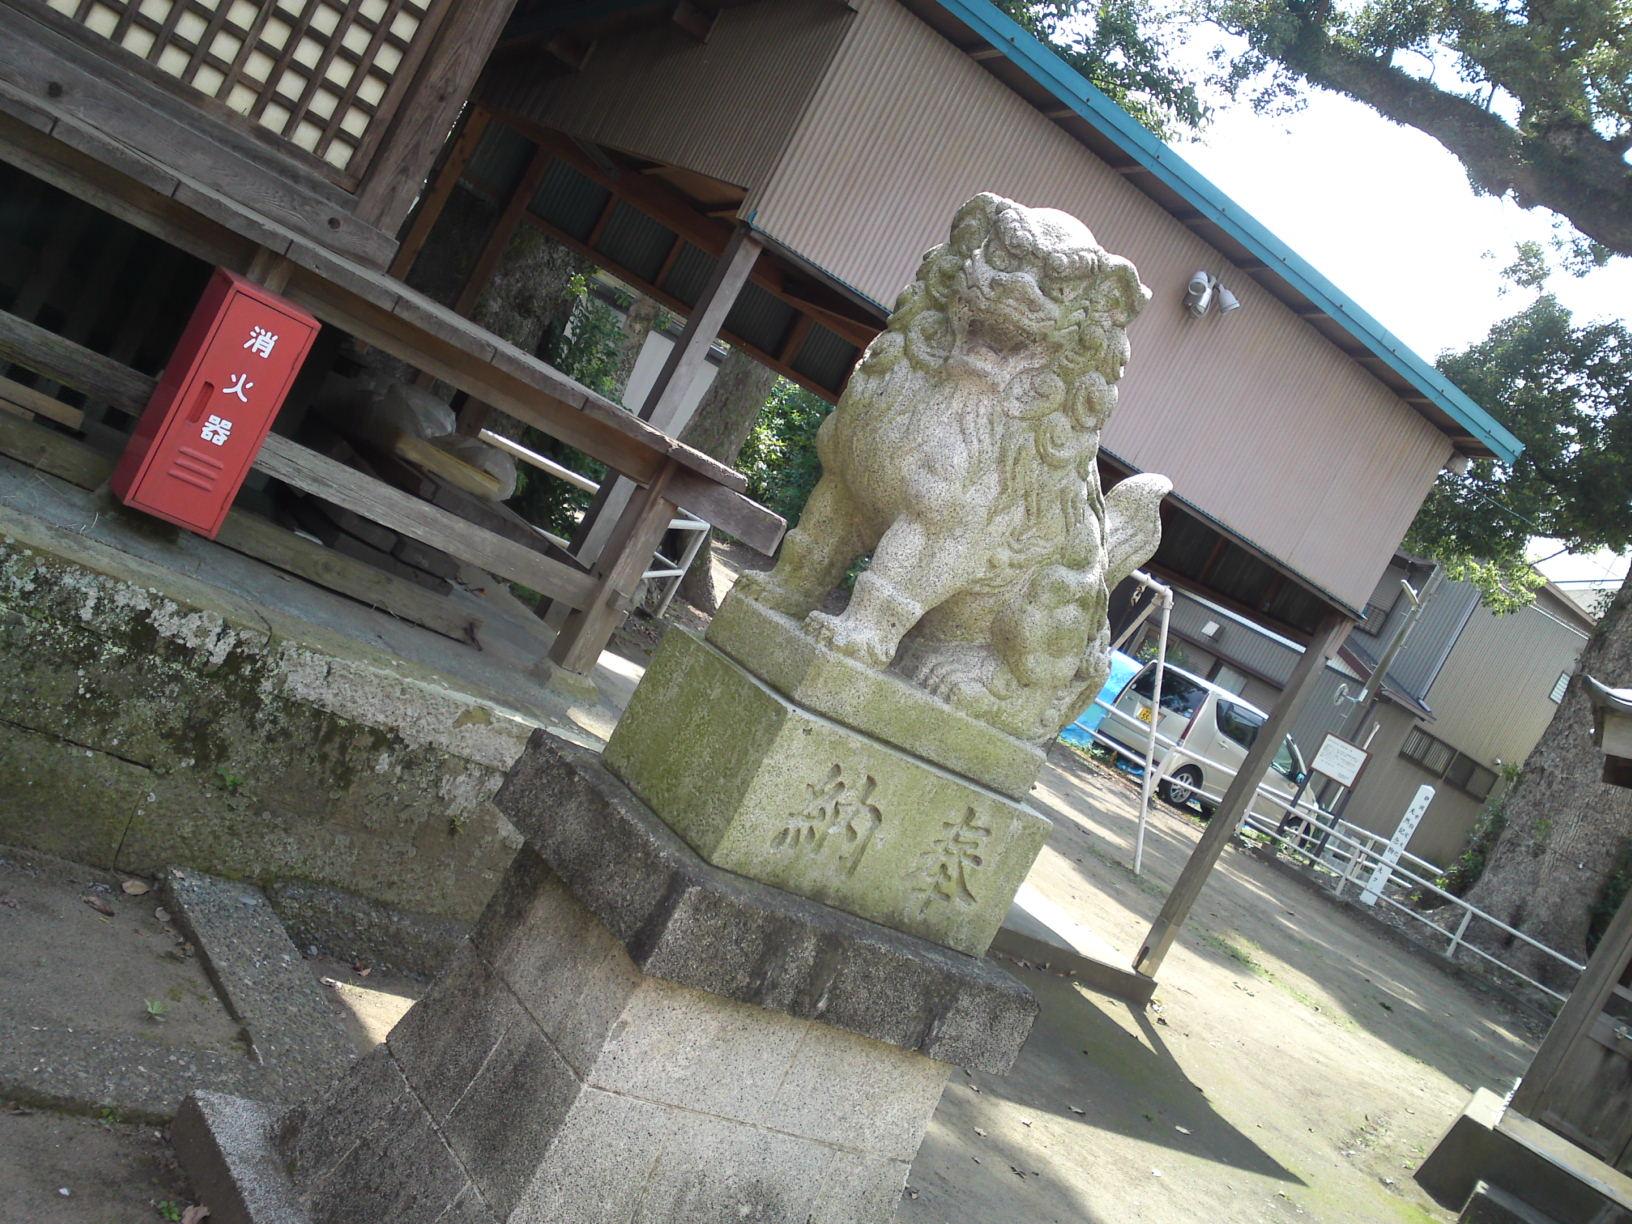 yashiro mature personals Watch kozue yashiro at freeones free sex videos, photo sets and biography all kozue yashiro videos, pictures and more.